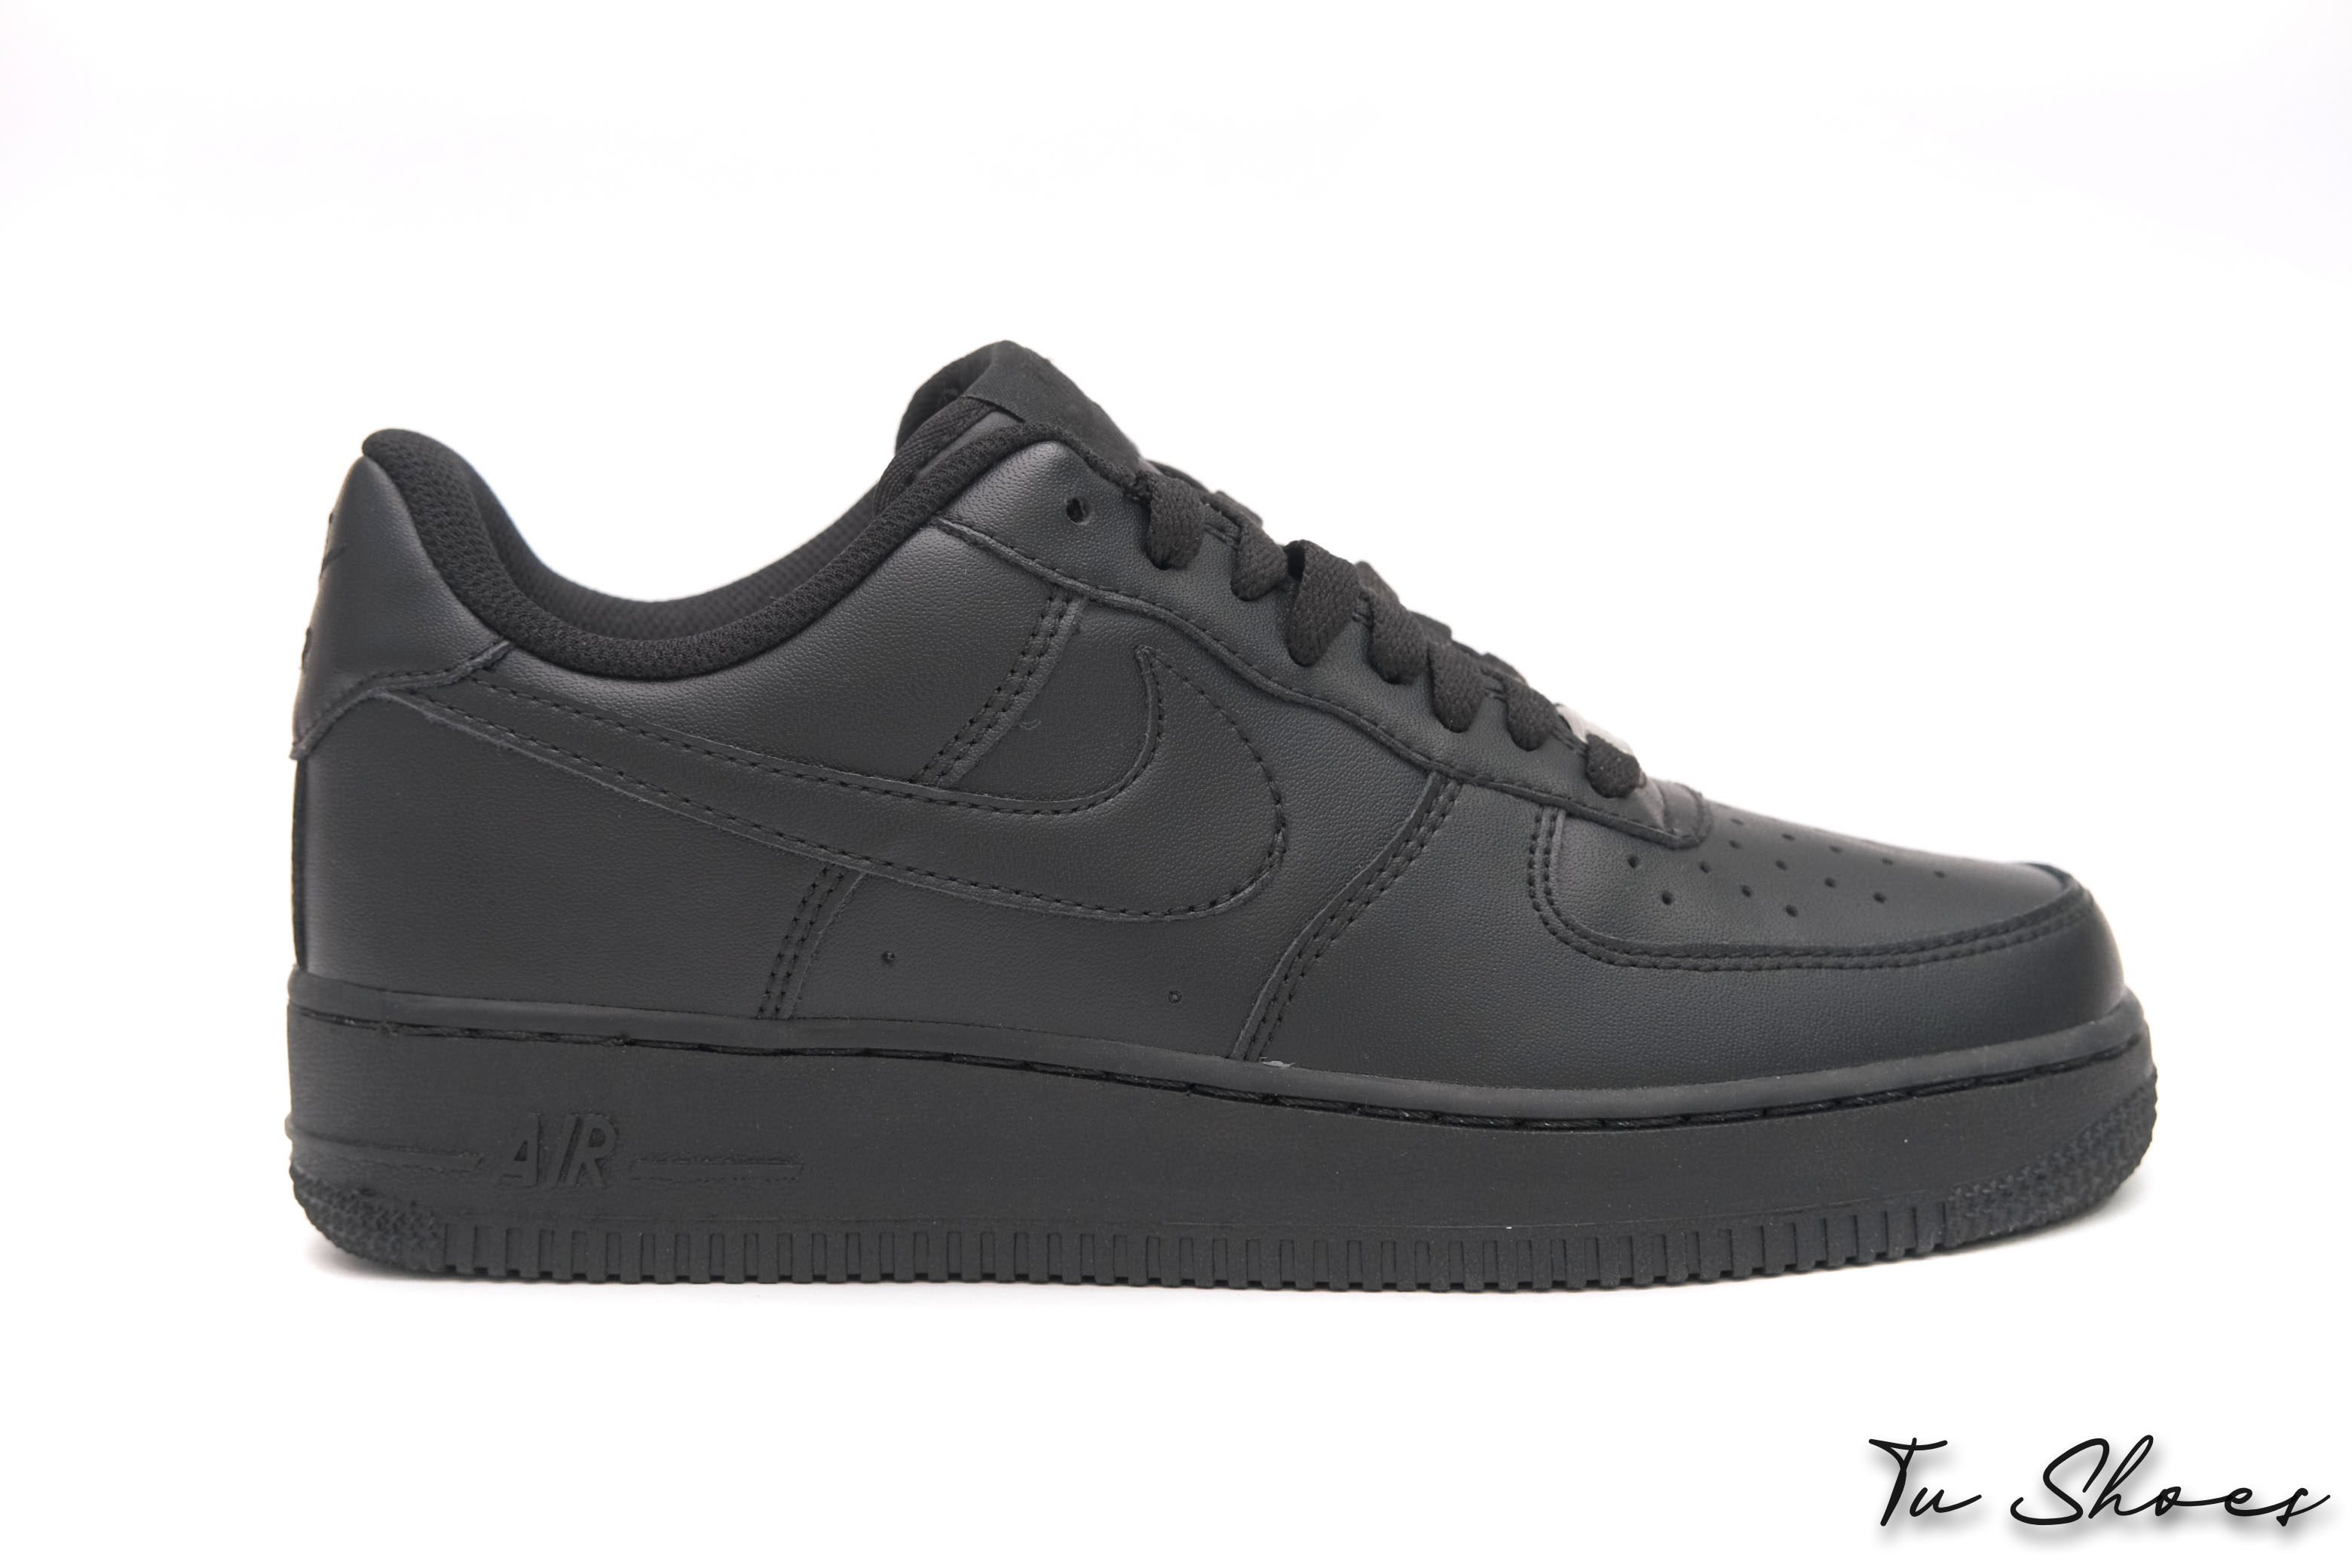 Air Force 1 Black Low